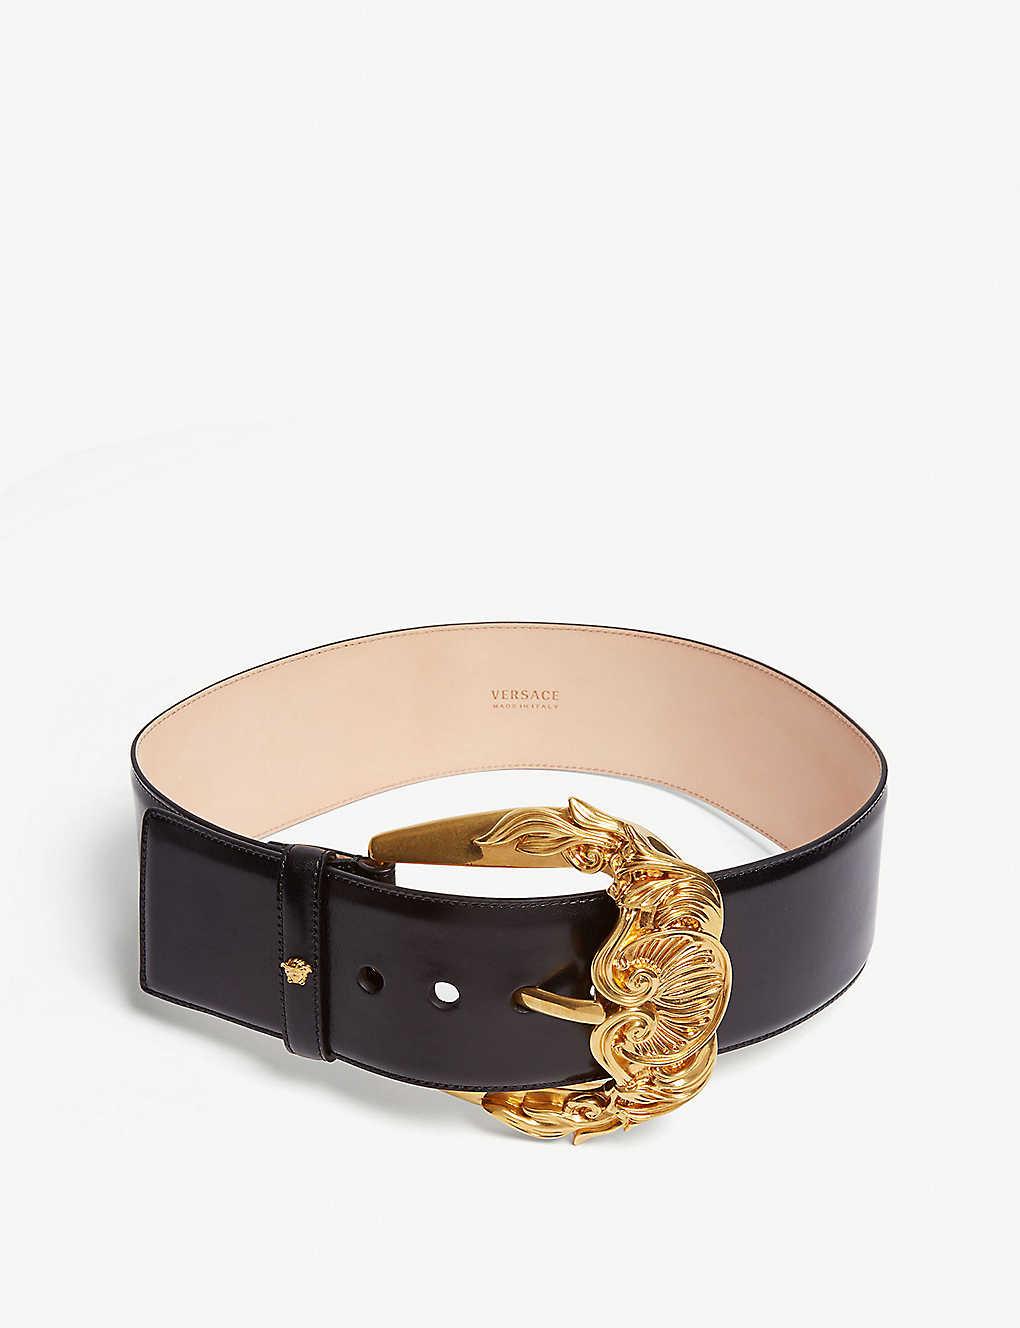 5444fc623e74a5 VERSACE - Barocco buckle leather belt | Selfridges.com